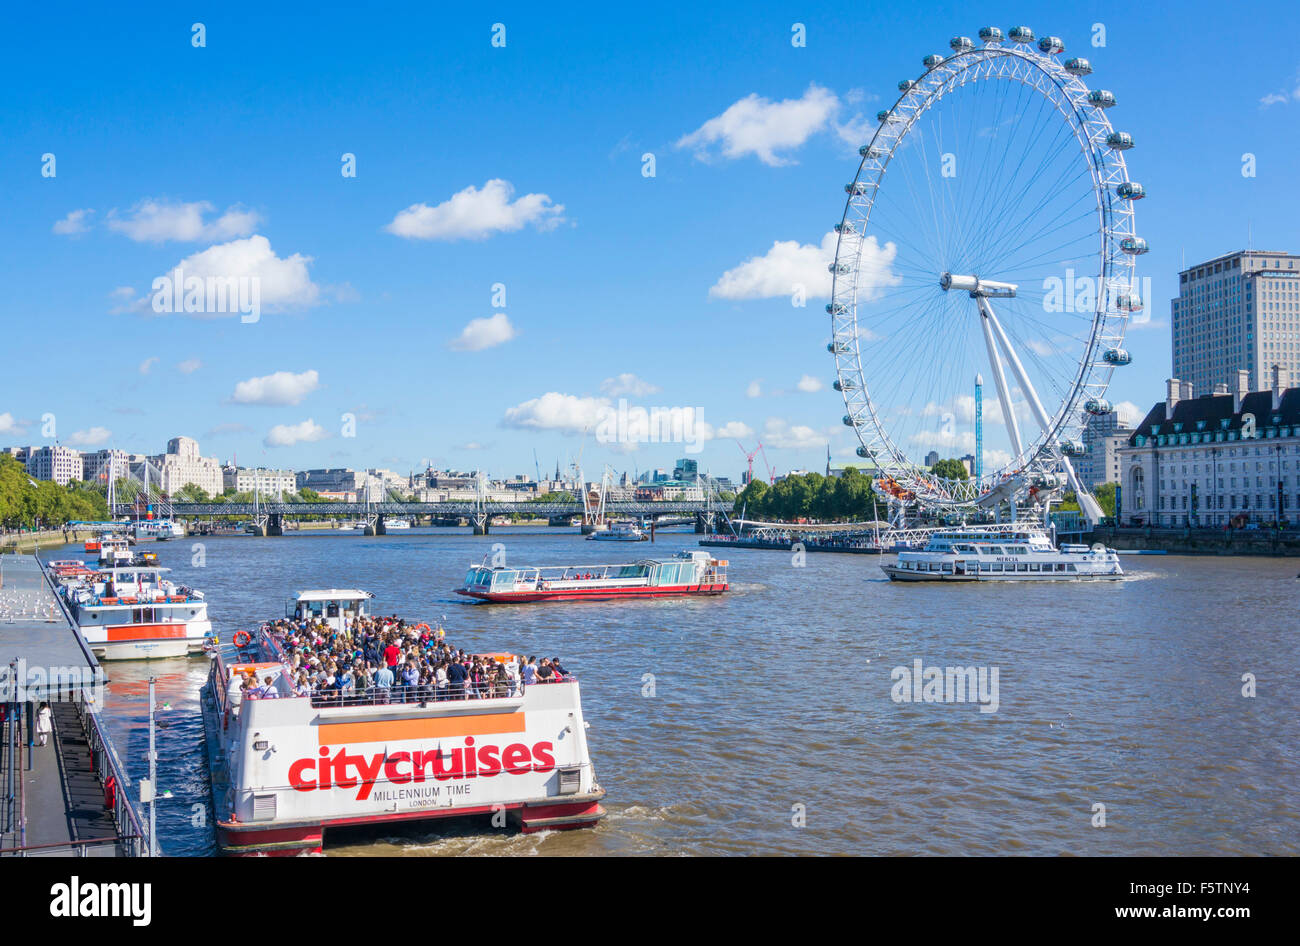 River Thames cruise boats and The London Eye on the South Bank of the River Thames London England GB UK EU Europe Stock Photo